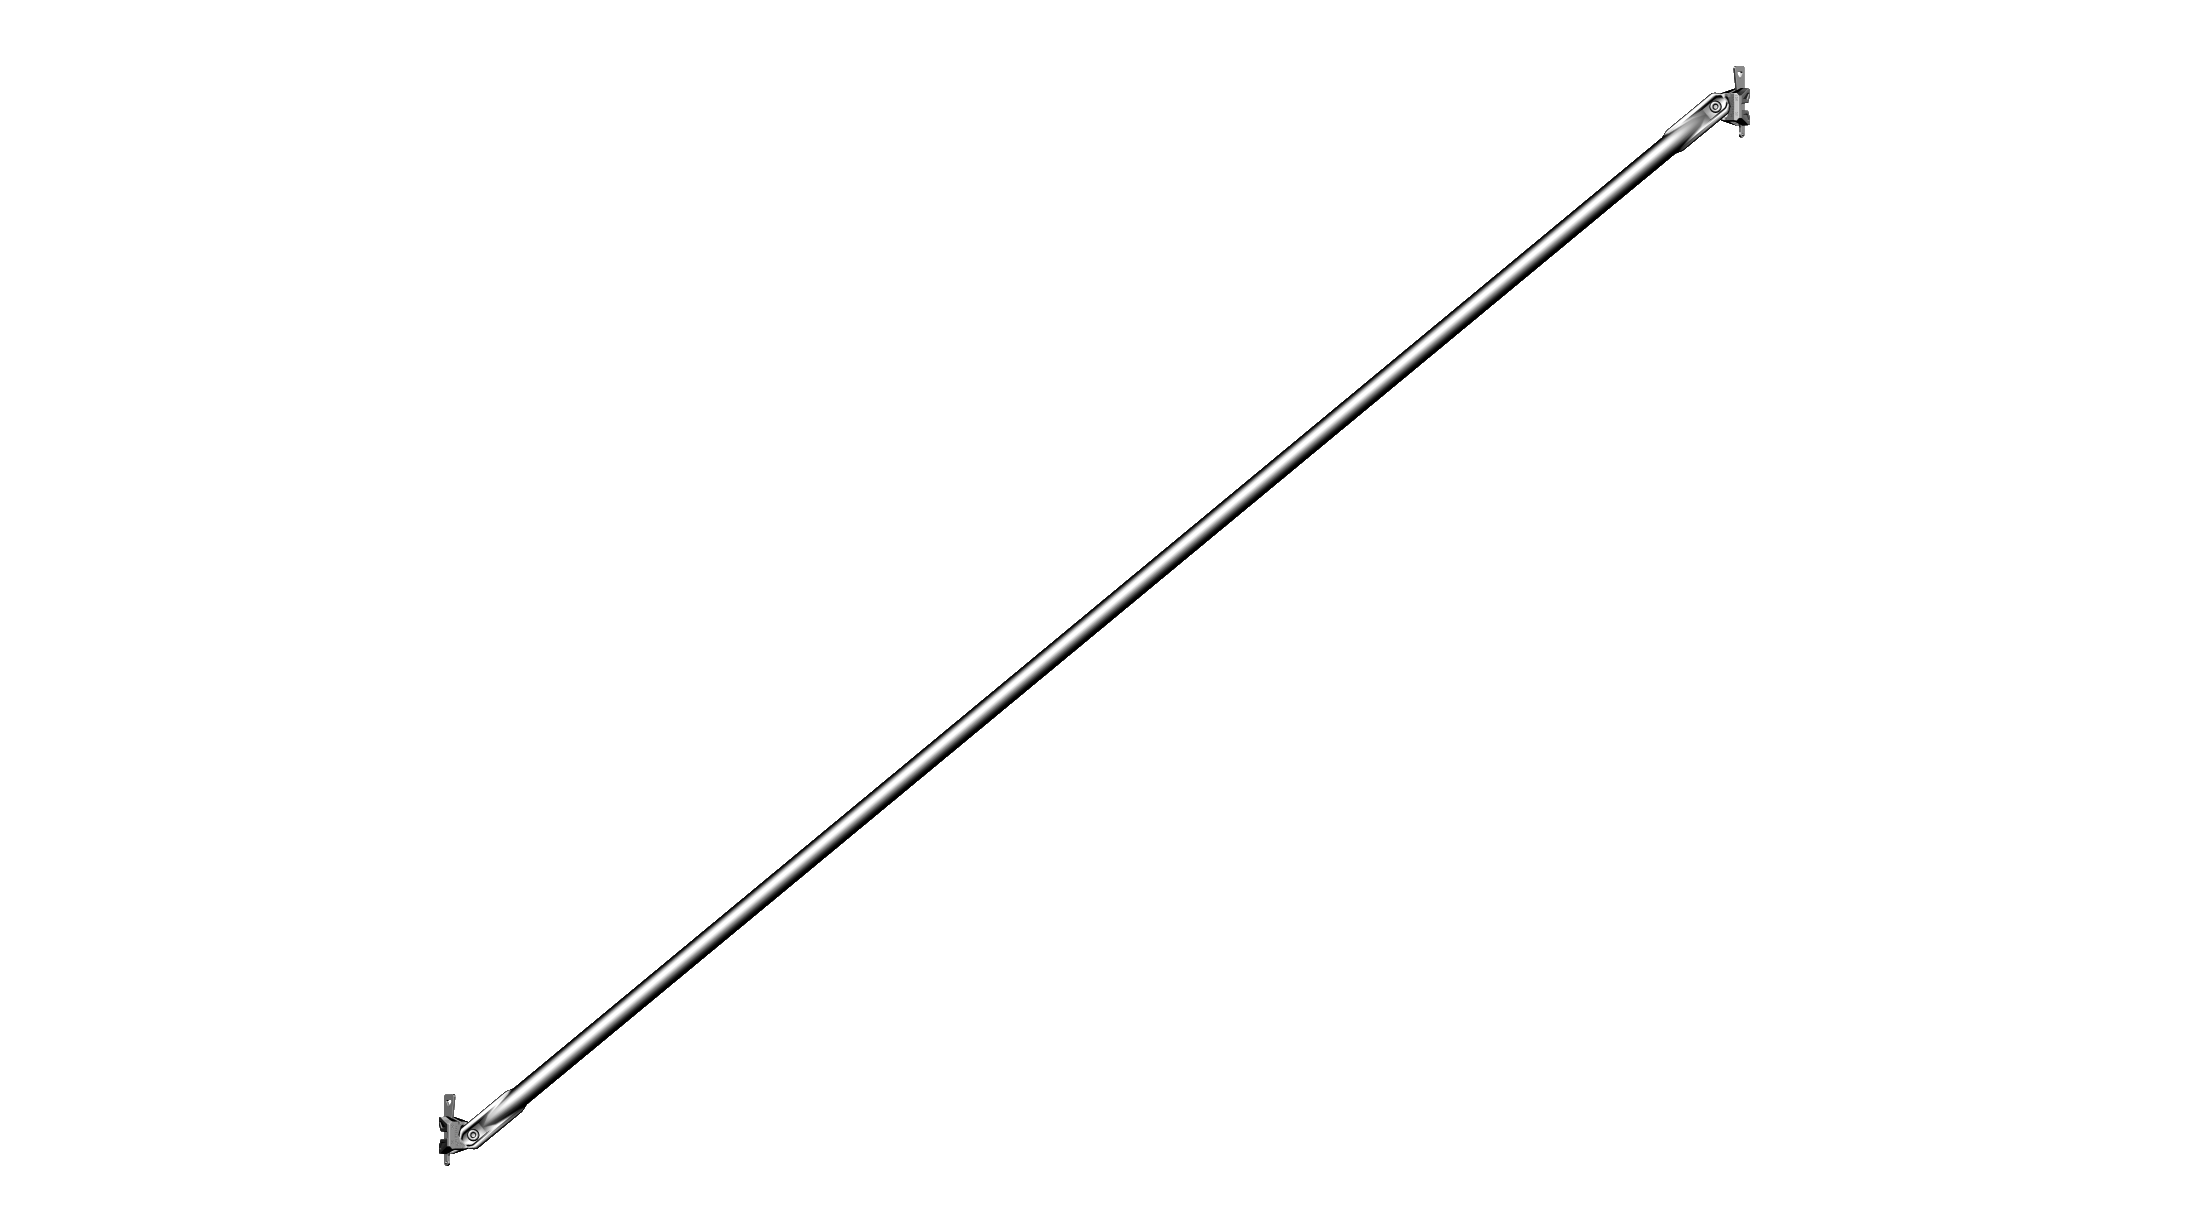 520315-diagonaal-207x150